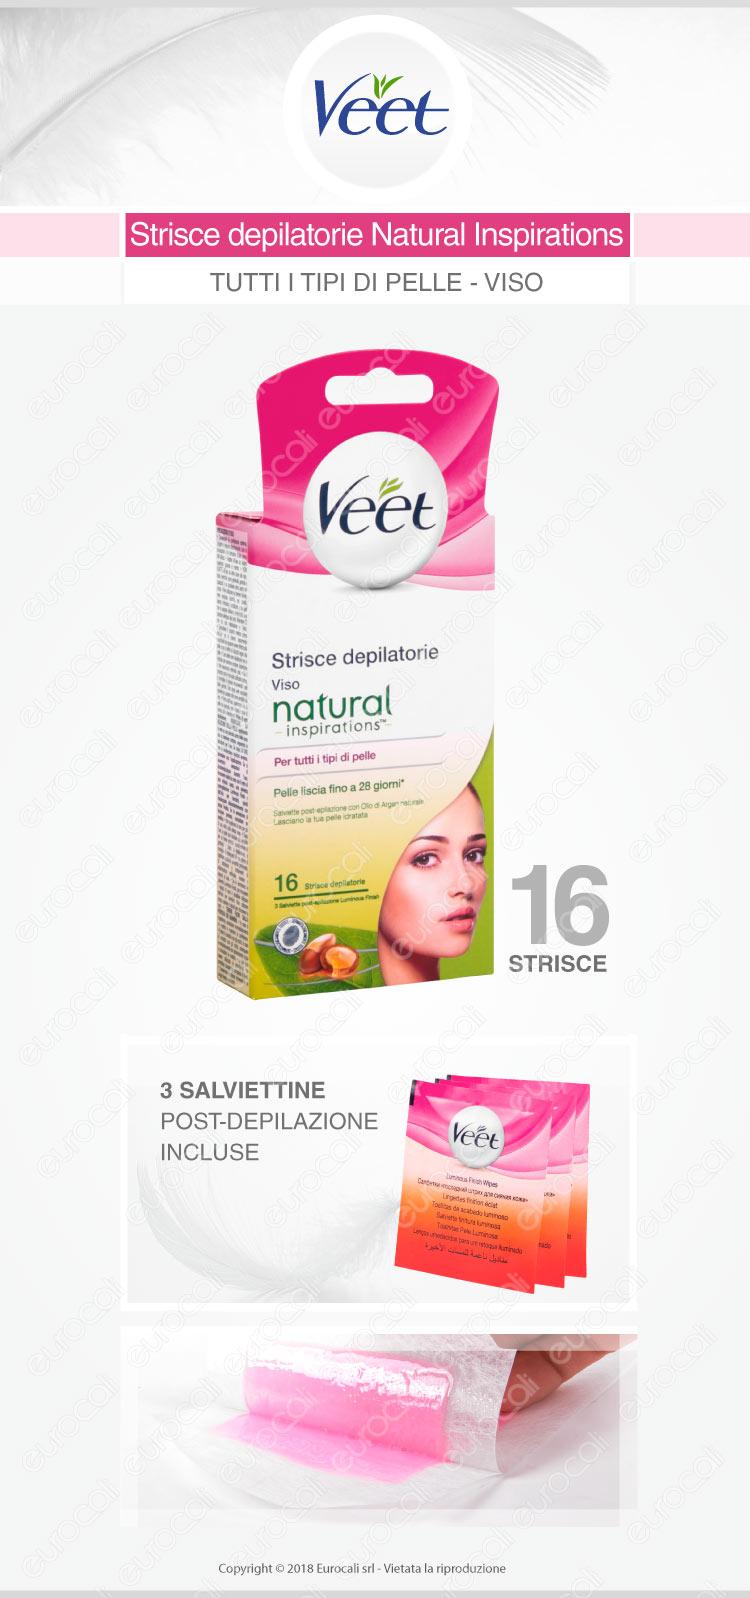 Veet strisce depilatorie viso natural inspirations